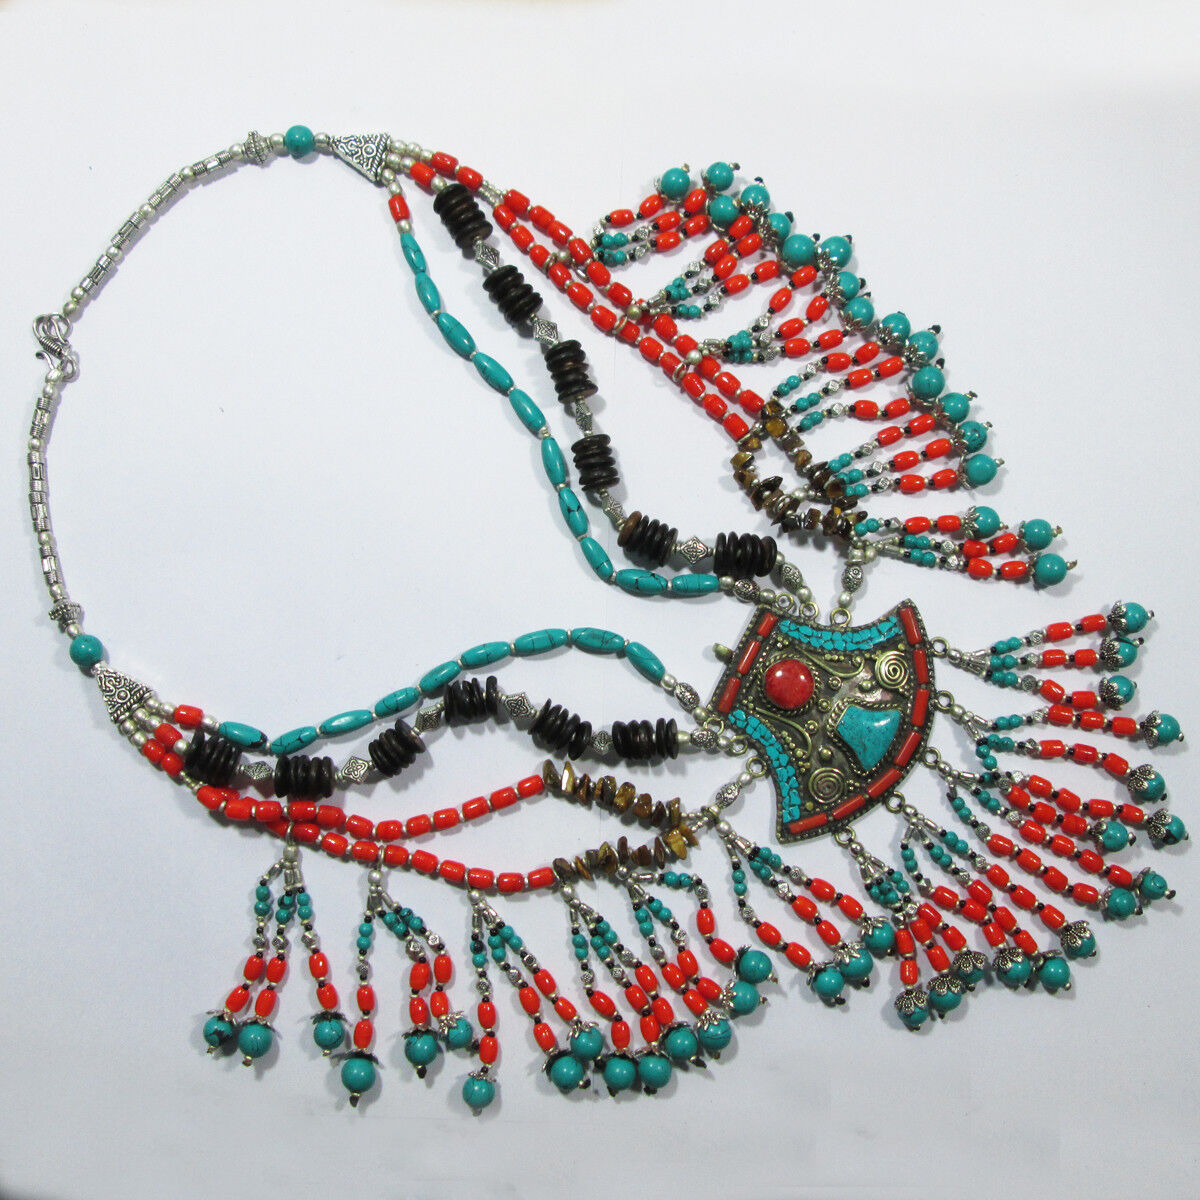 Tibetan turquoise Tiger eye Coral beads handcrafted bohemian jewellery